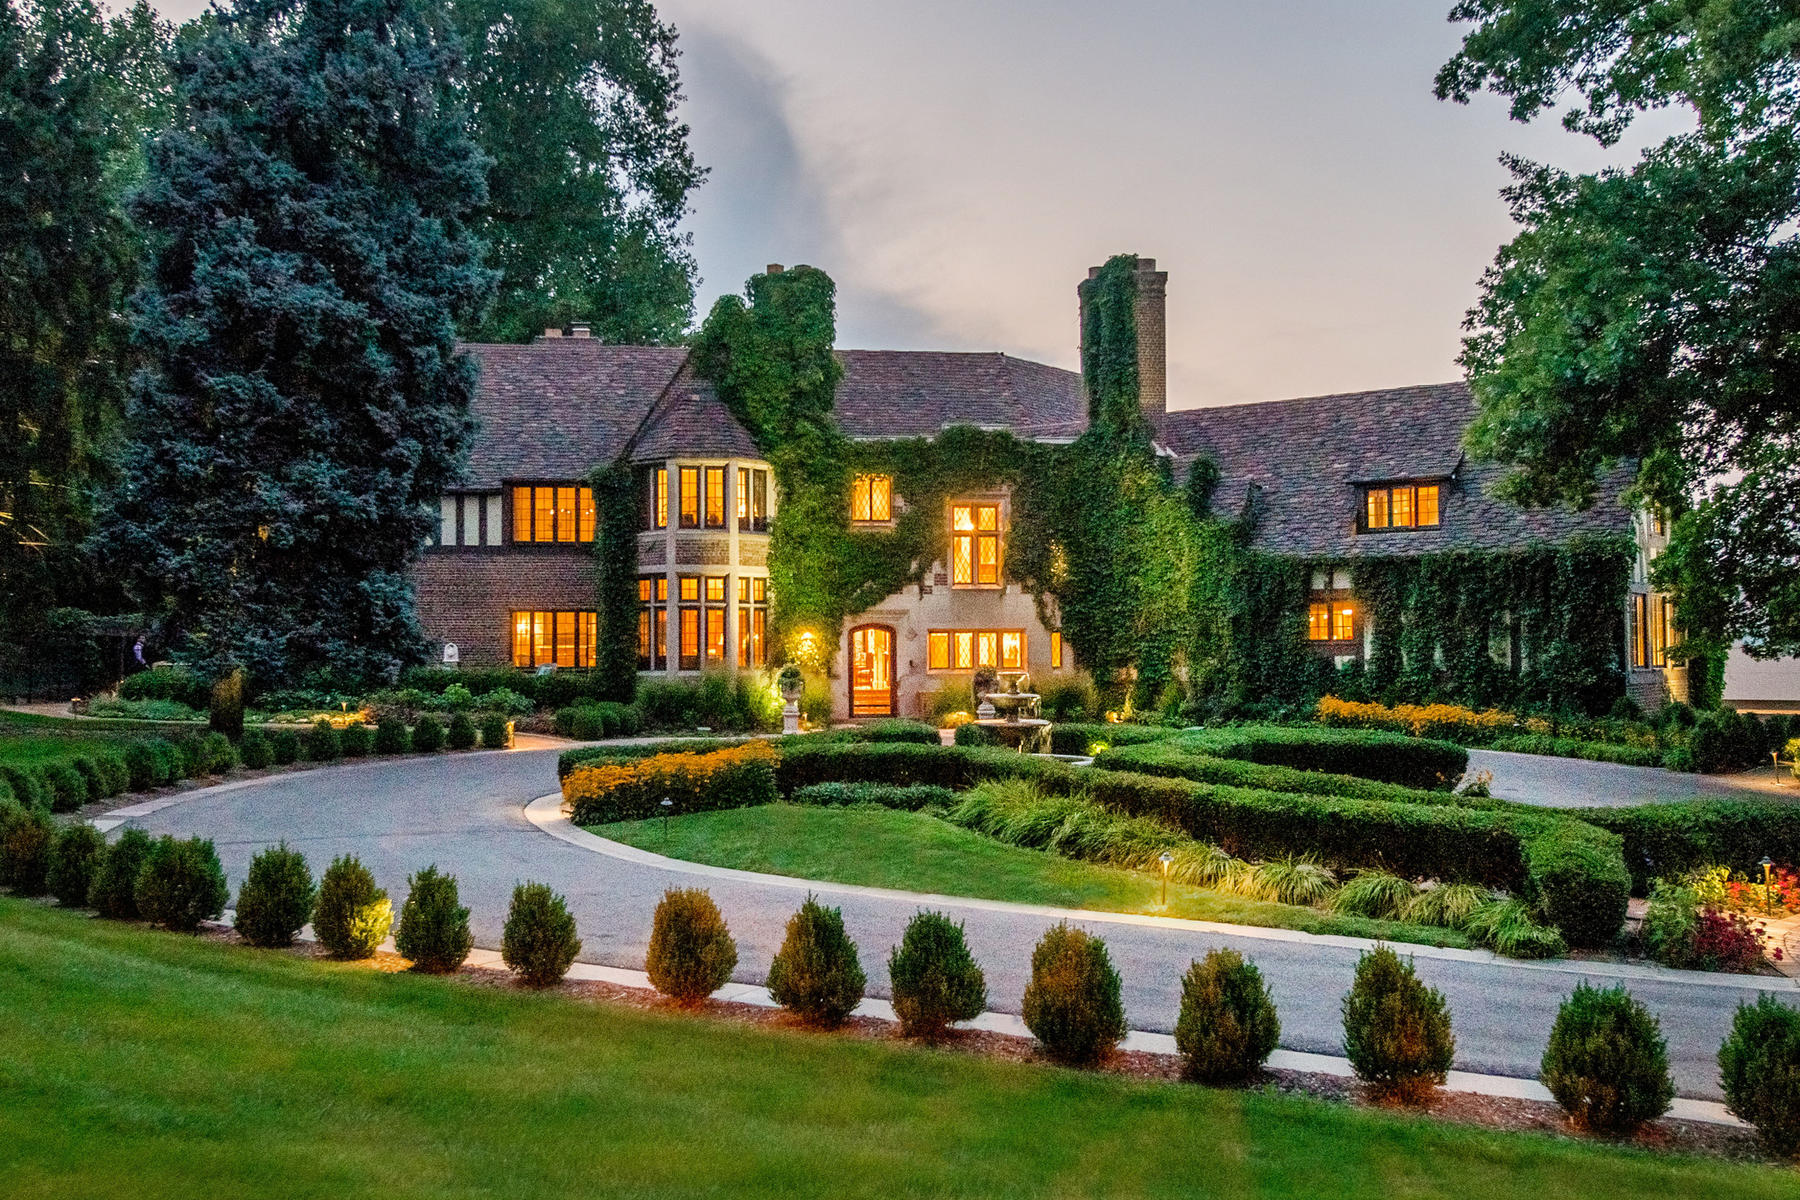 Single Family Homes for Sale at Ambitious Renovation of this Beautiful 1932 Tudor 2301 E. Alameda Avenue Denver, Colorado 80209 United States